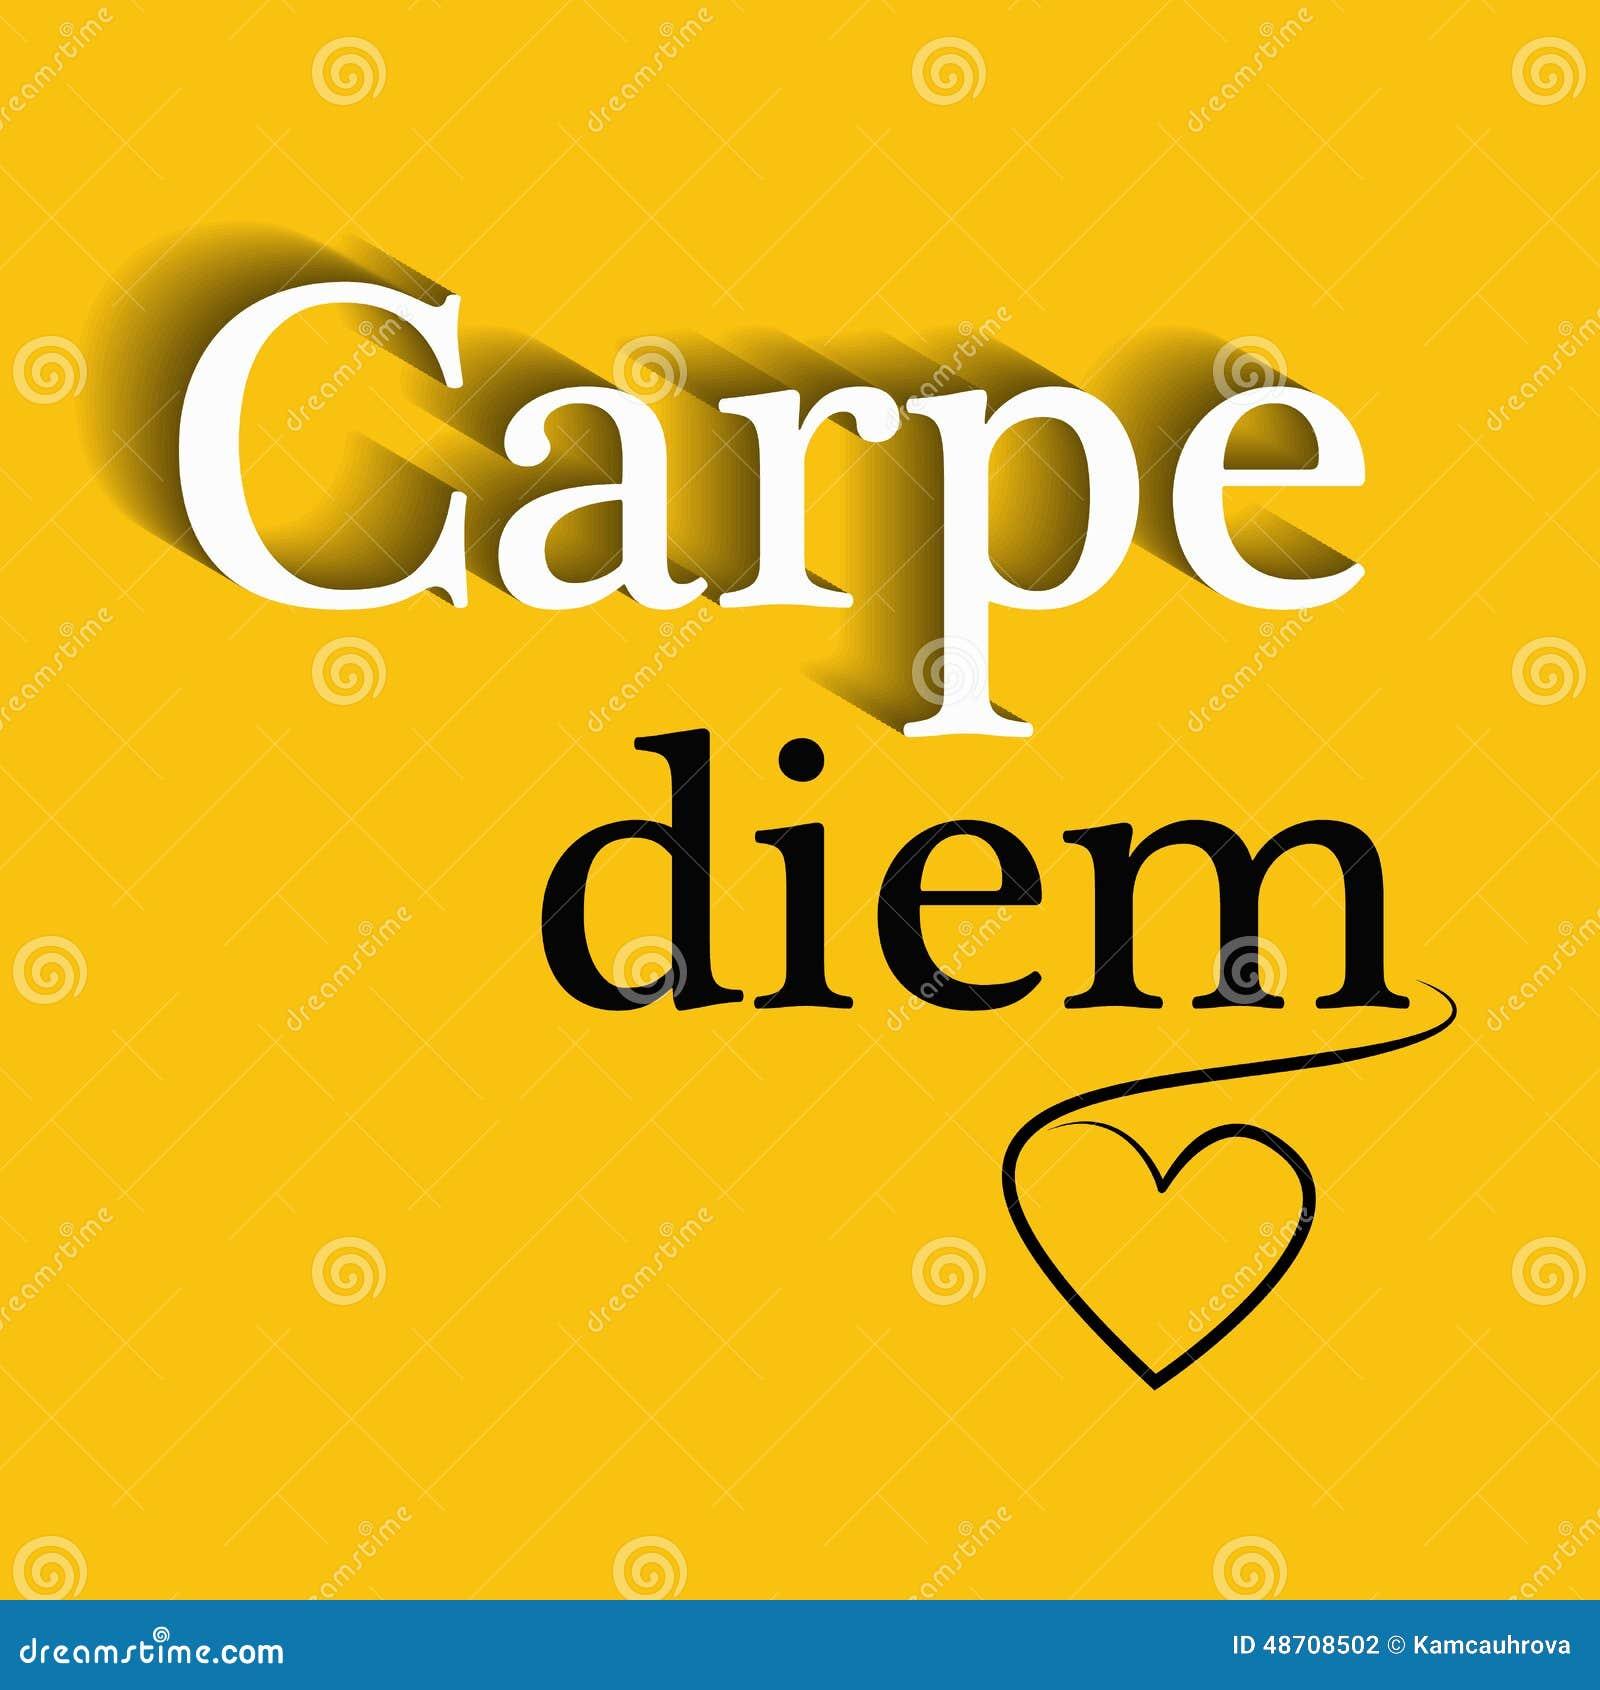 Carpe Diem Motivational Quote Stock Vector Illustration Of Diem